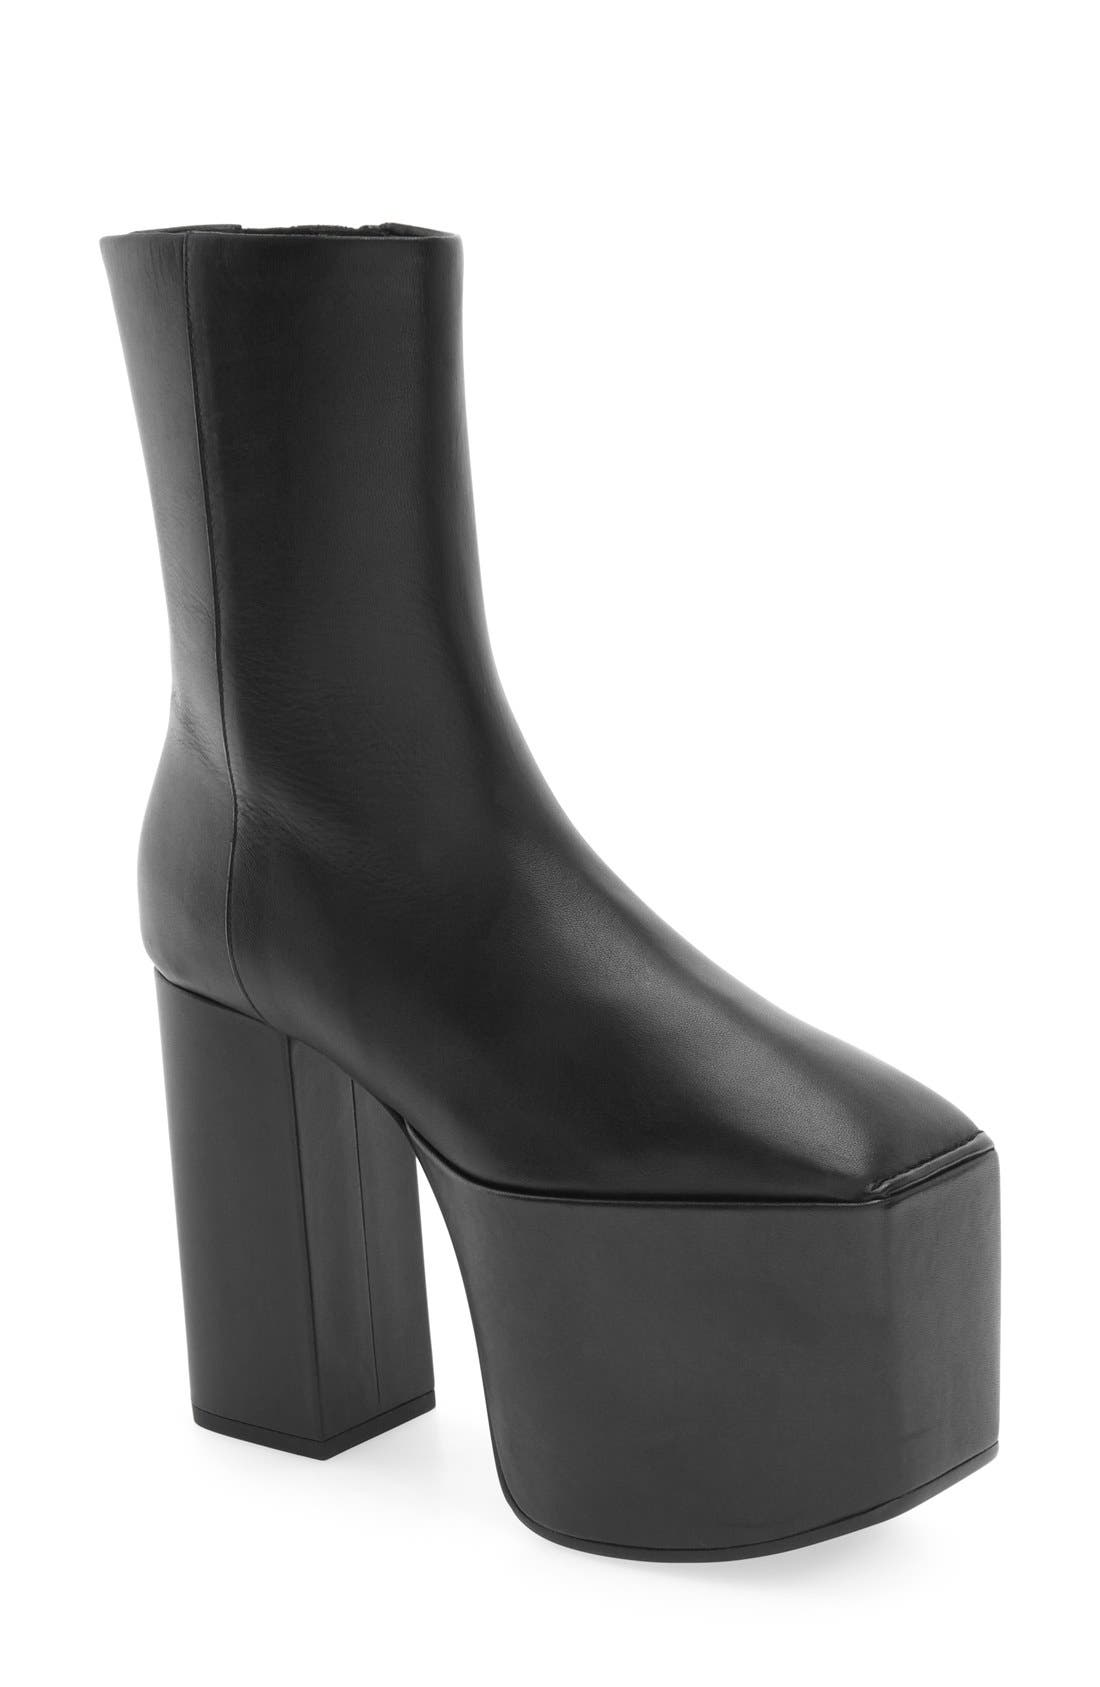 Main Image - Balenciaga Platform Bootie (Women)